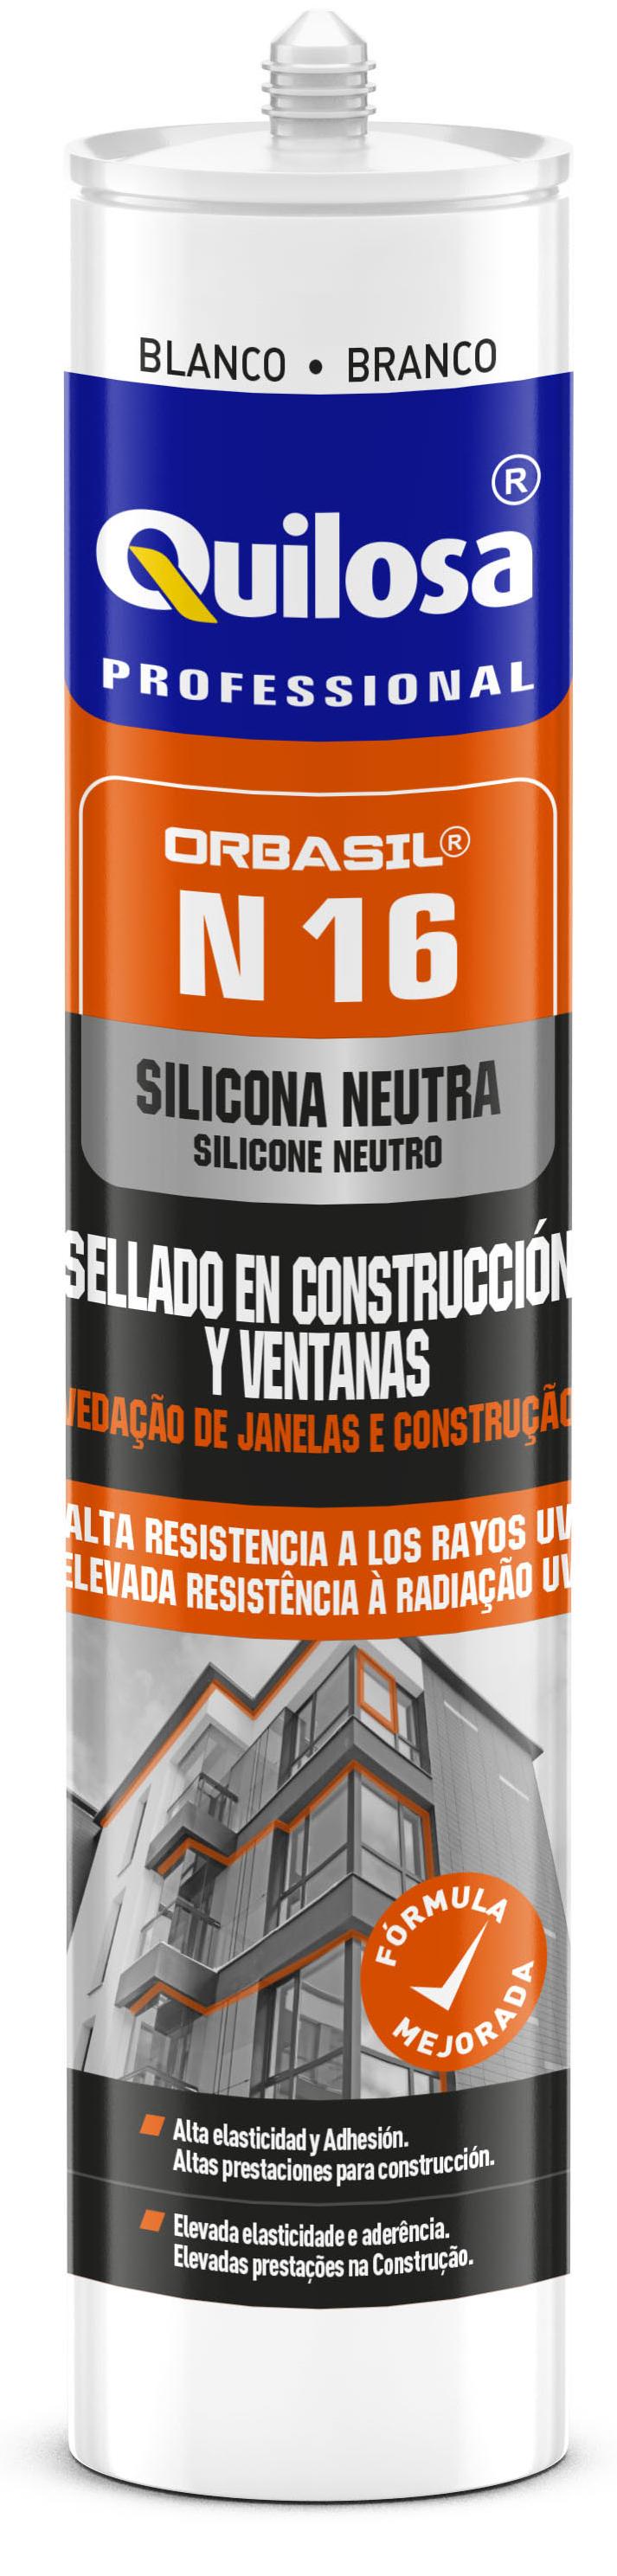 ORBASIL-N-16-Construcci%C3%B3n_Ventanas-